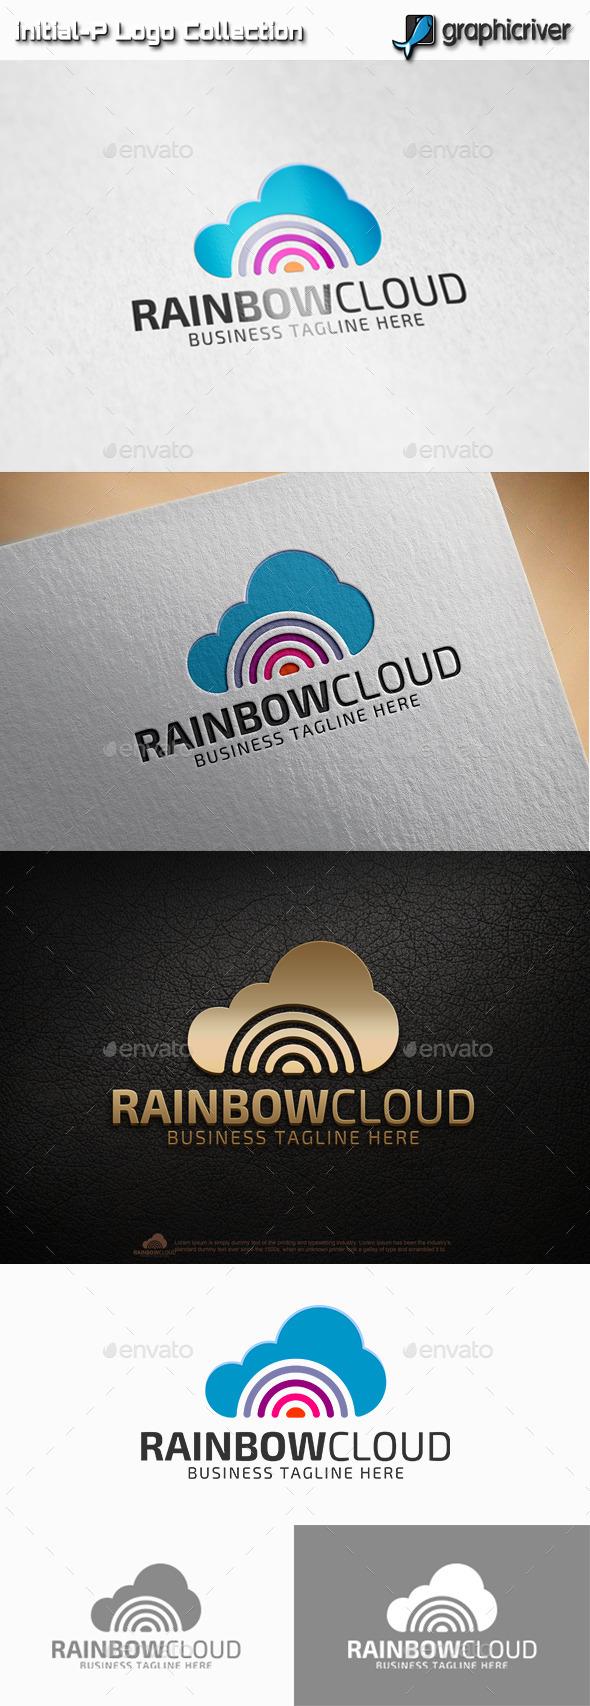 GraphicRiver Rainbow Cloud Logo 11204525